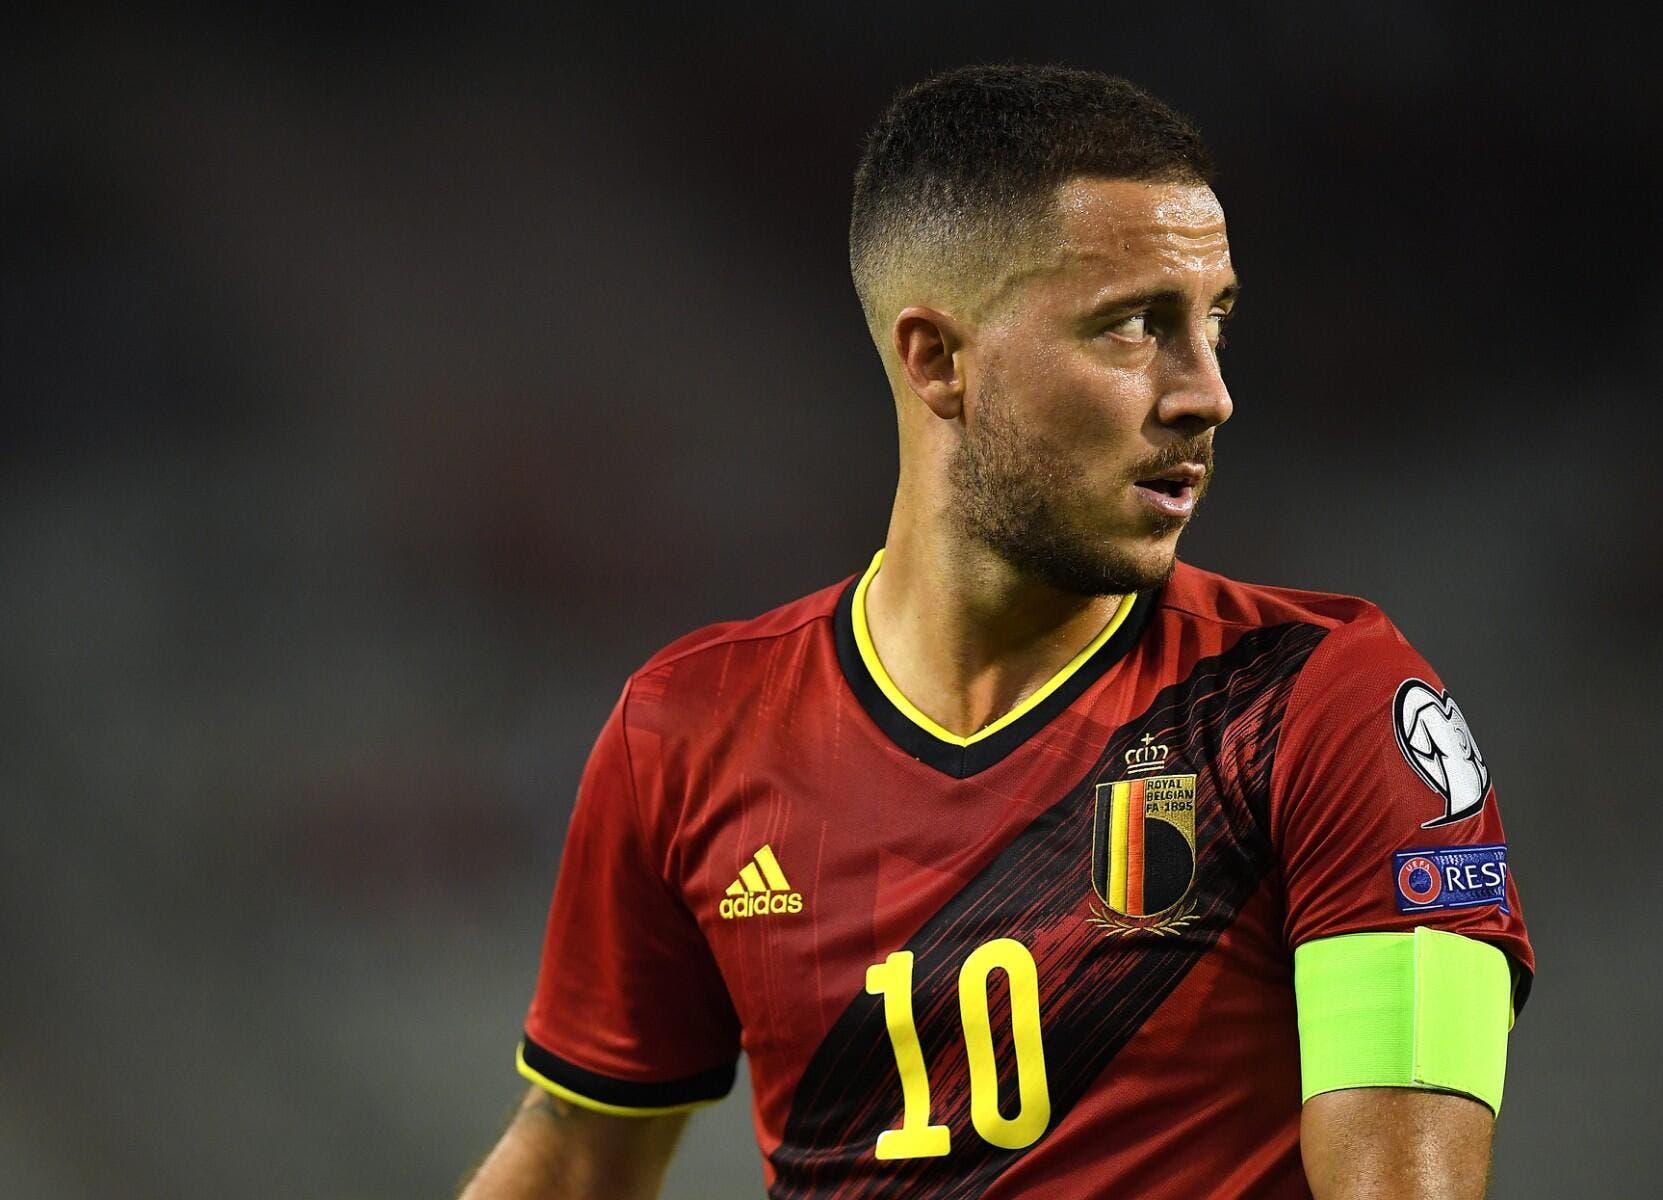 Chelsea Open to Re-Signing Hazard